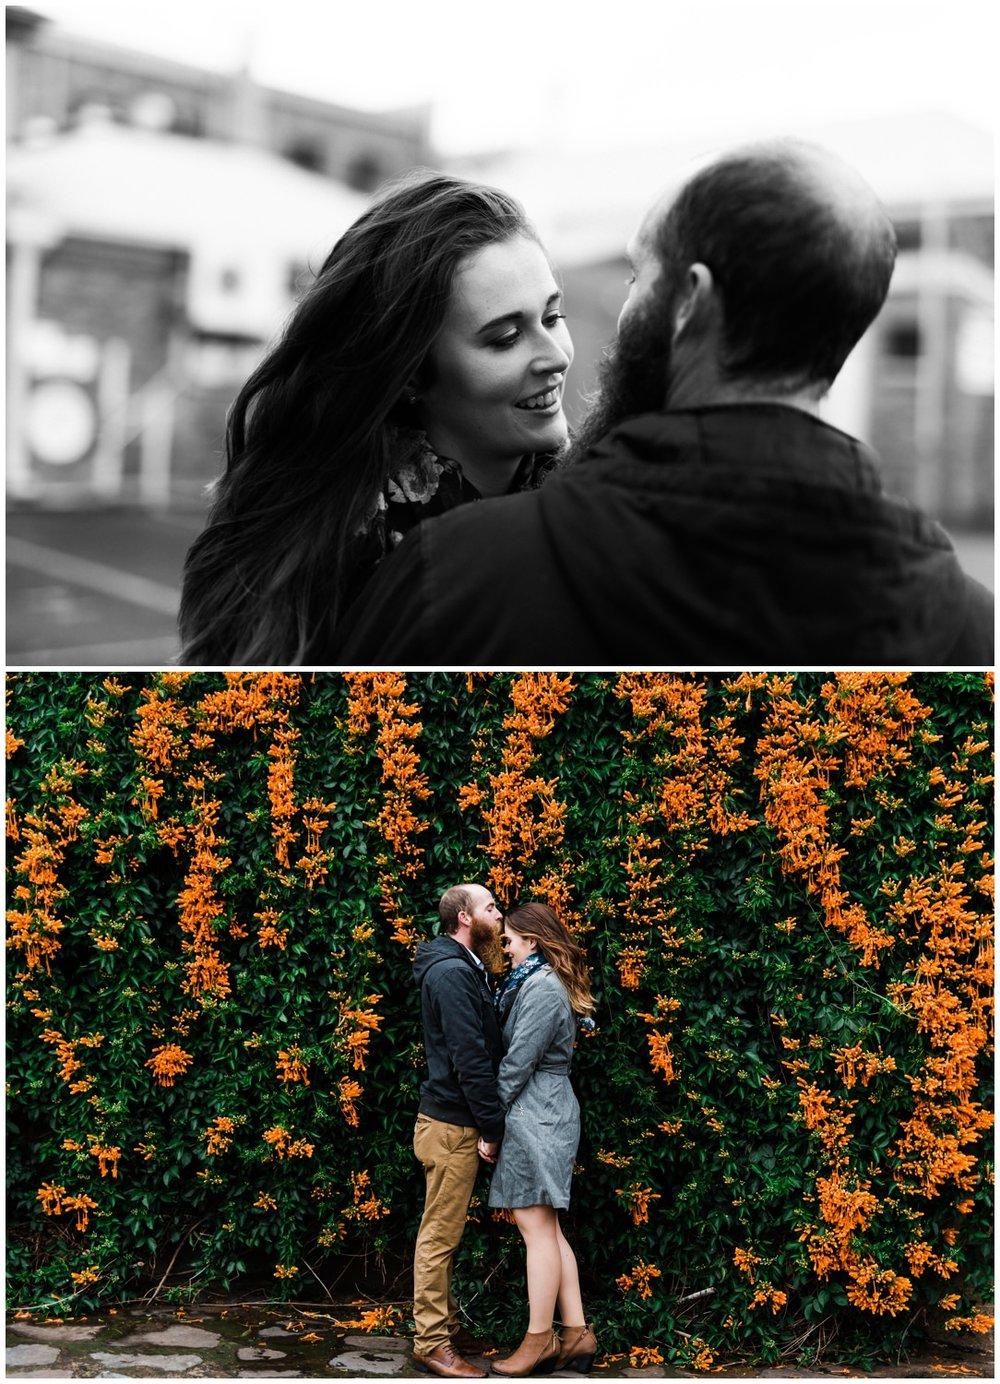 -toowoomba-engagement-shoot-first-coat-street-art5.jpg